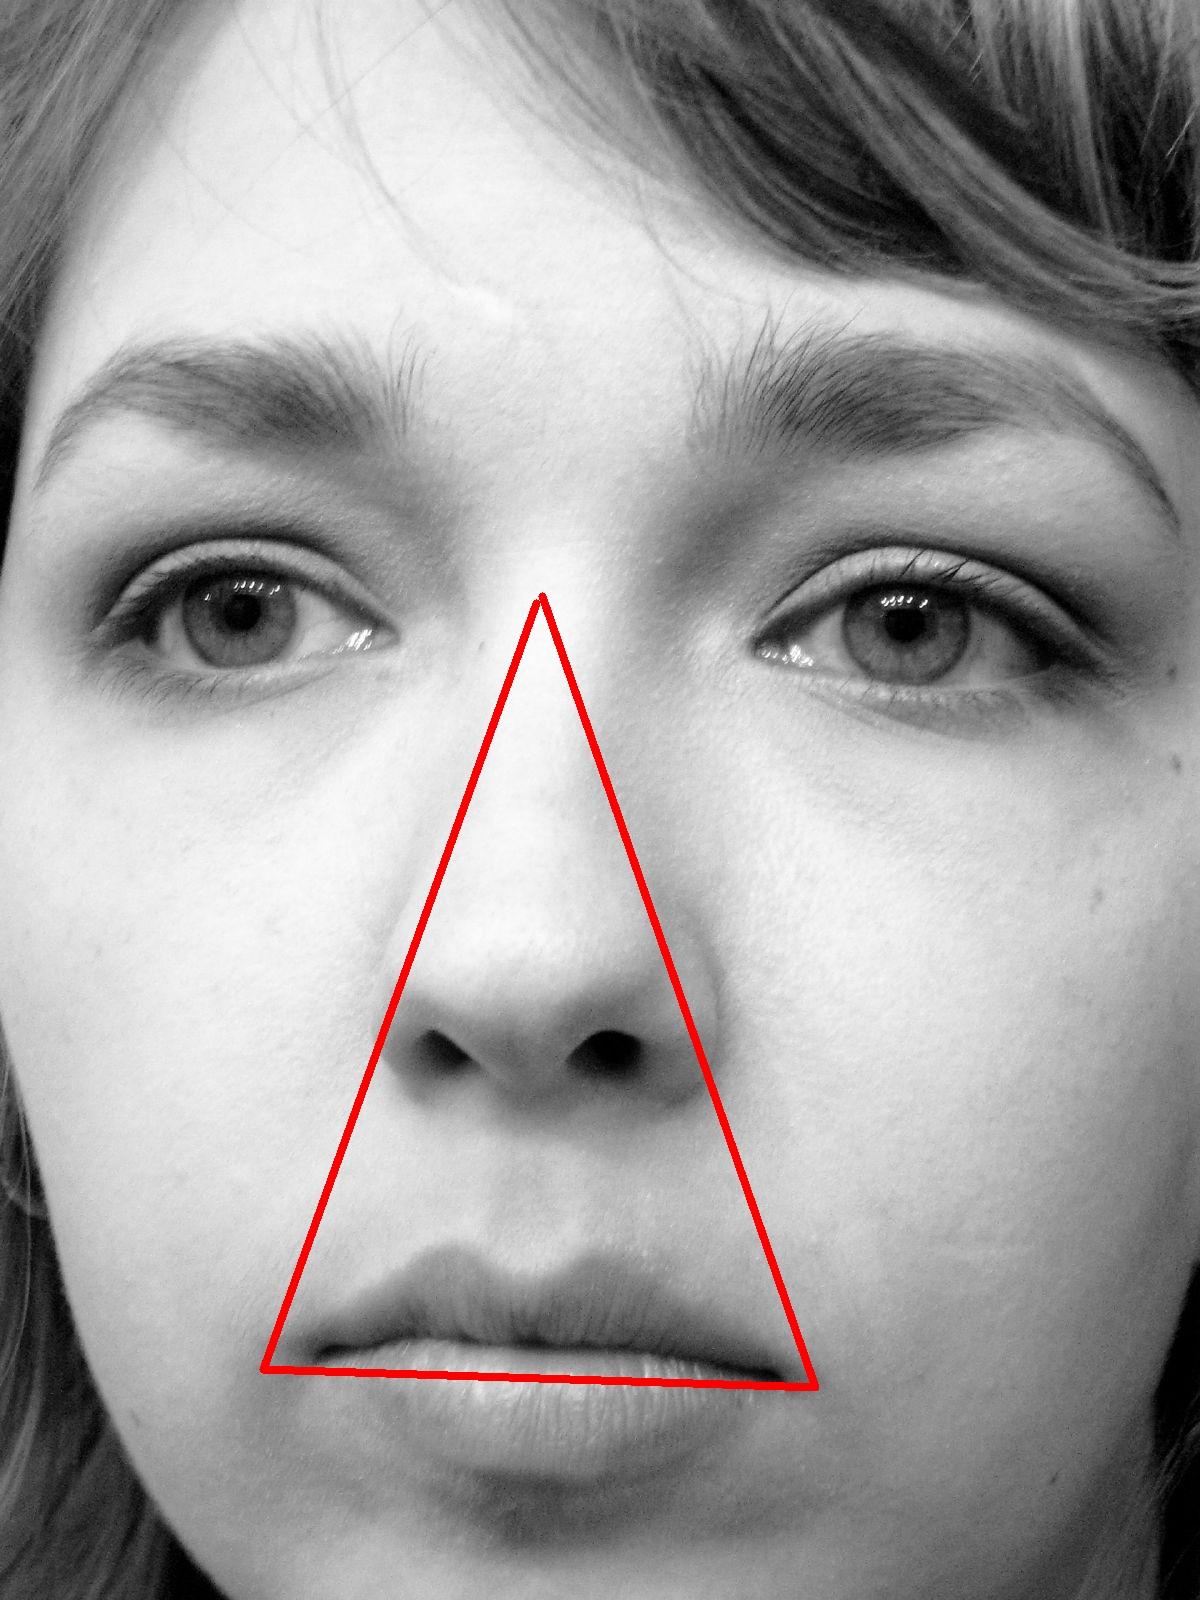 Danger_triangle_of_the_face_diagram.jpg